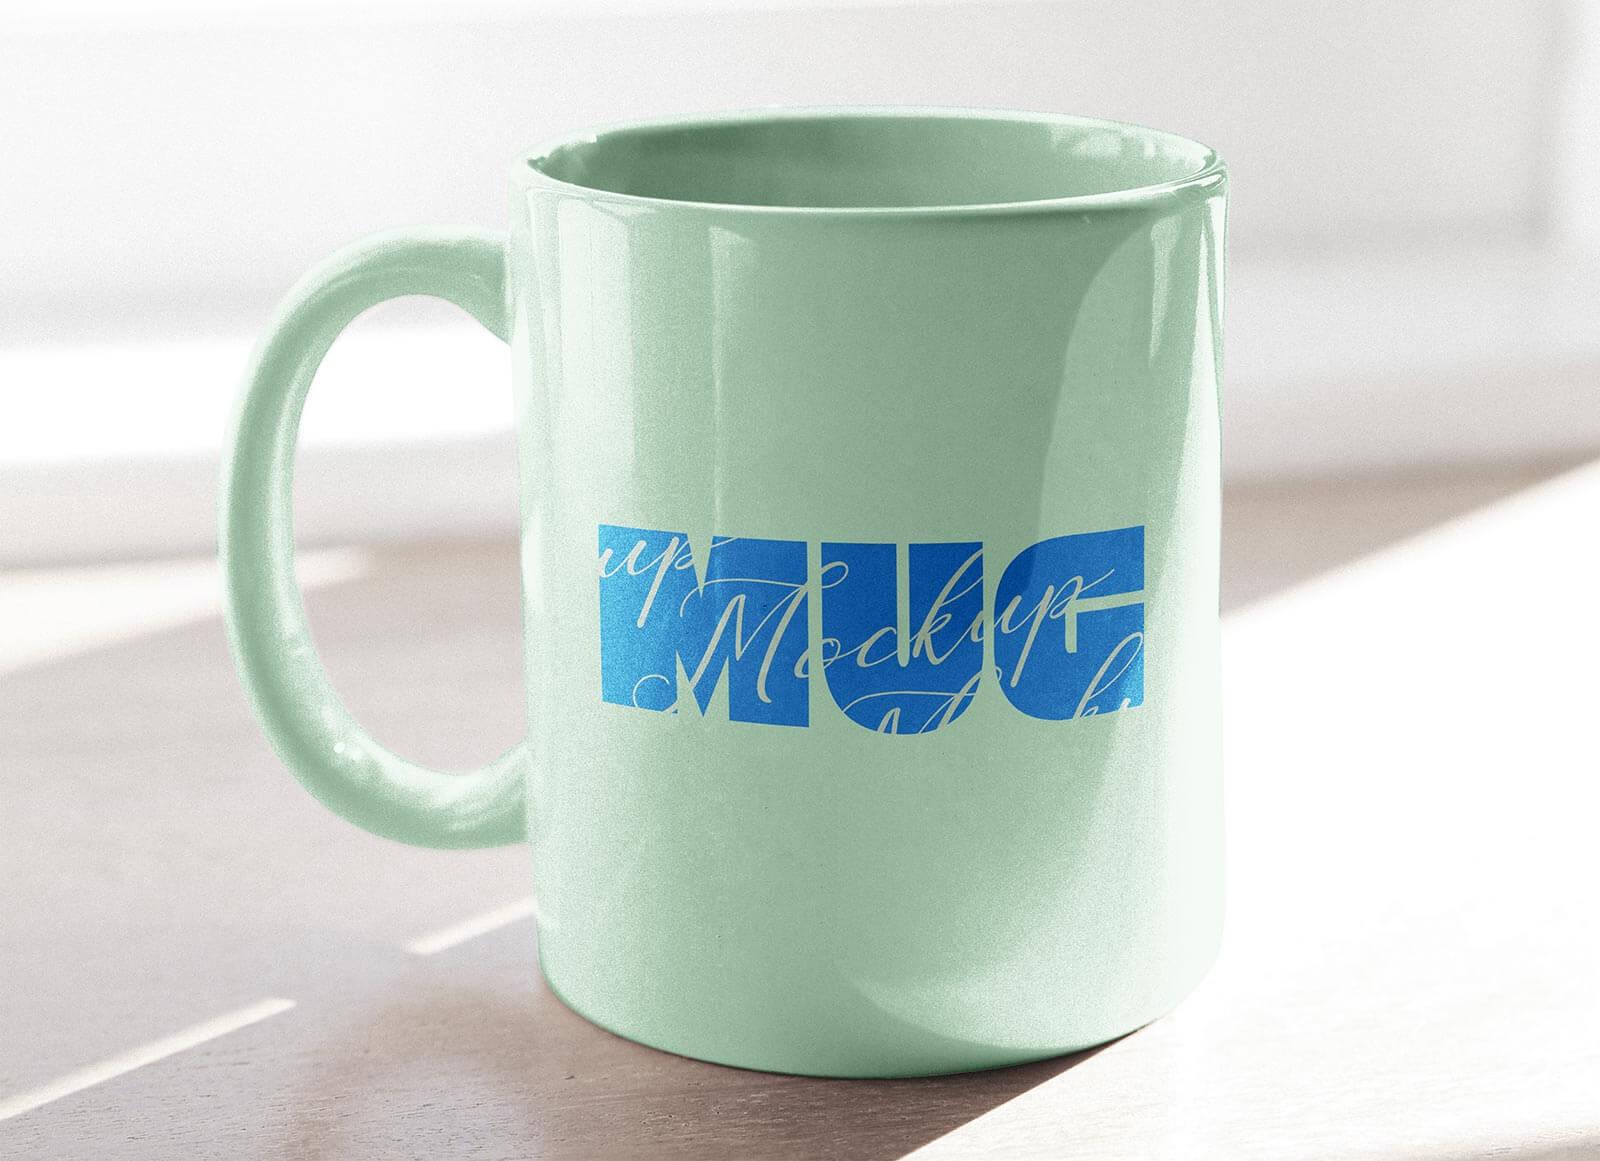 Free Sunlight Mug Mockup PSD